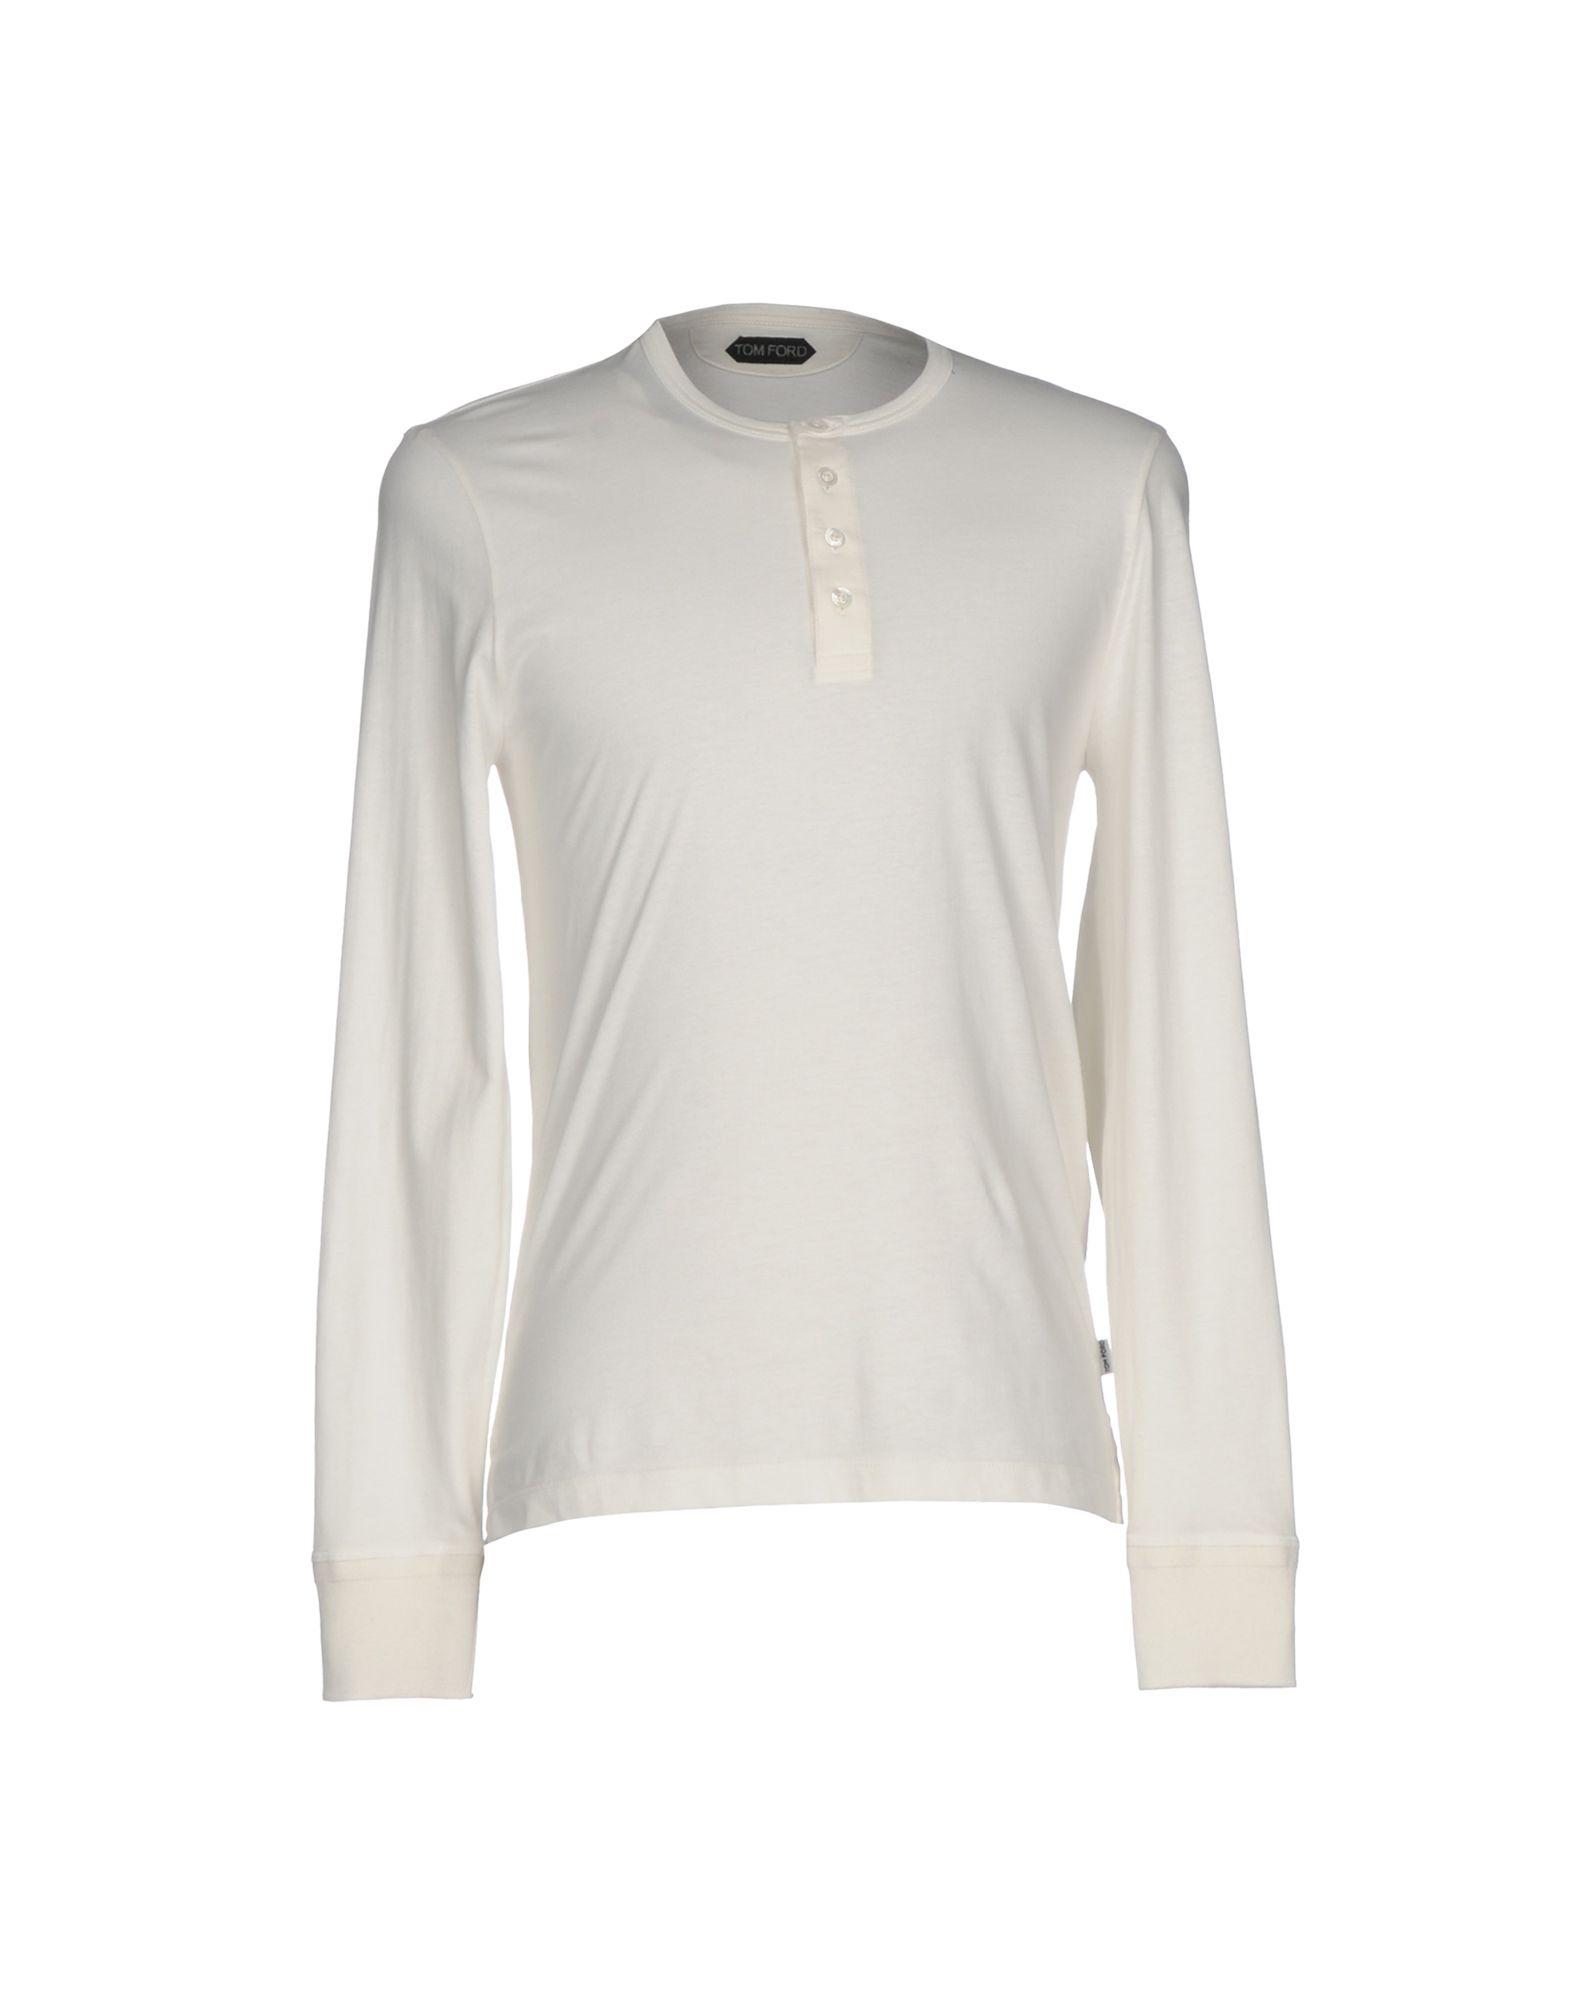 T-Shirt Tom Ford Donna - Acquista online su